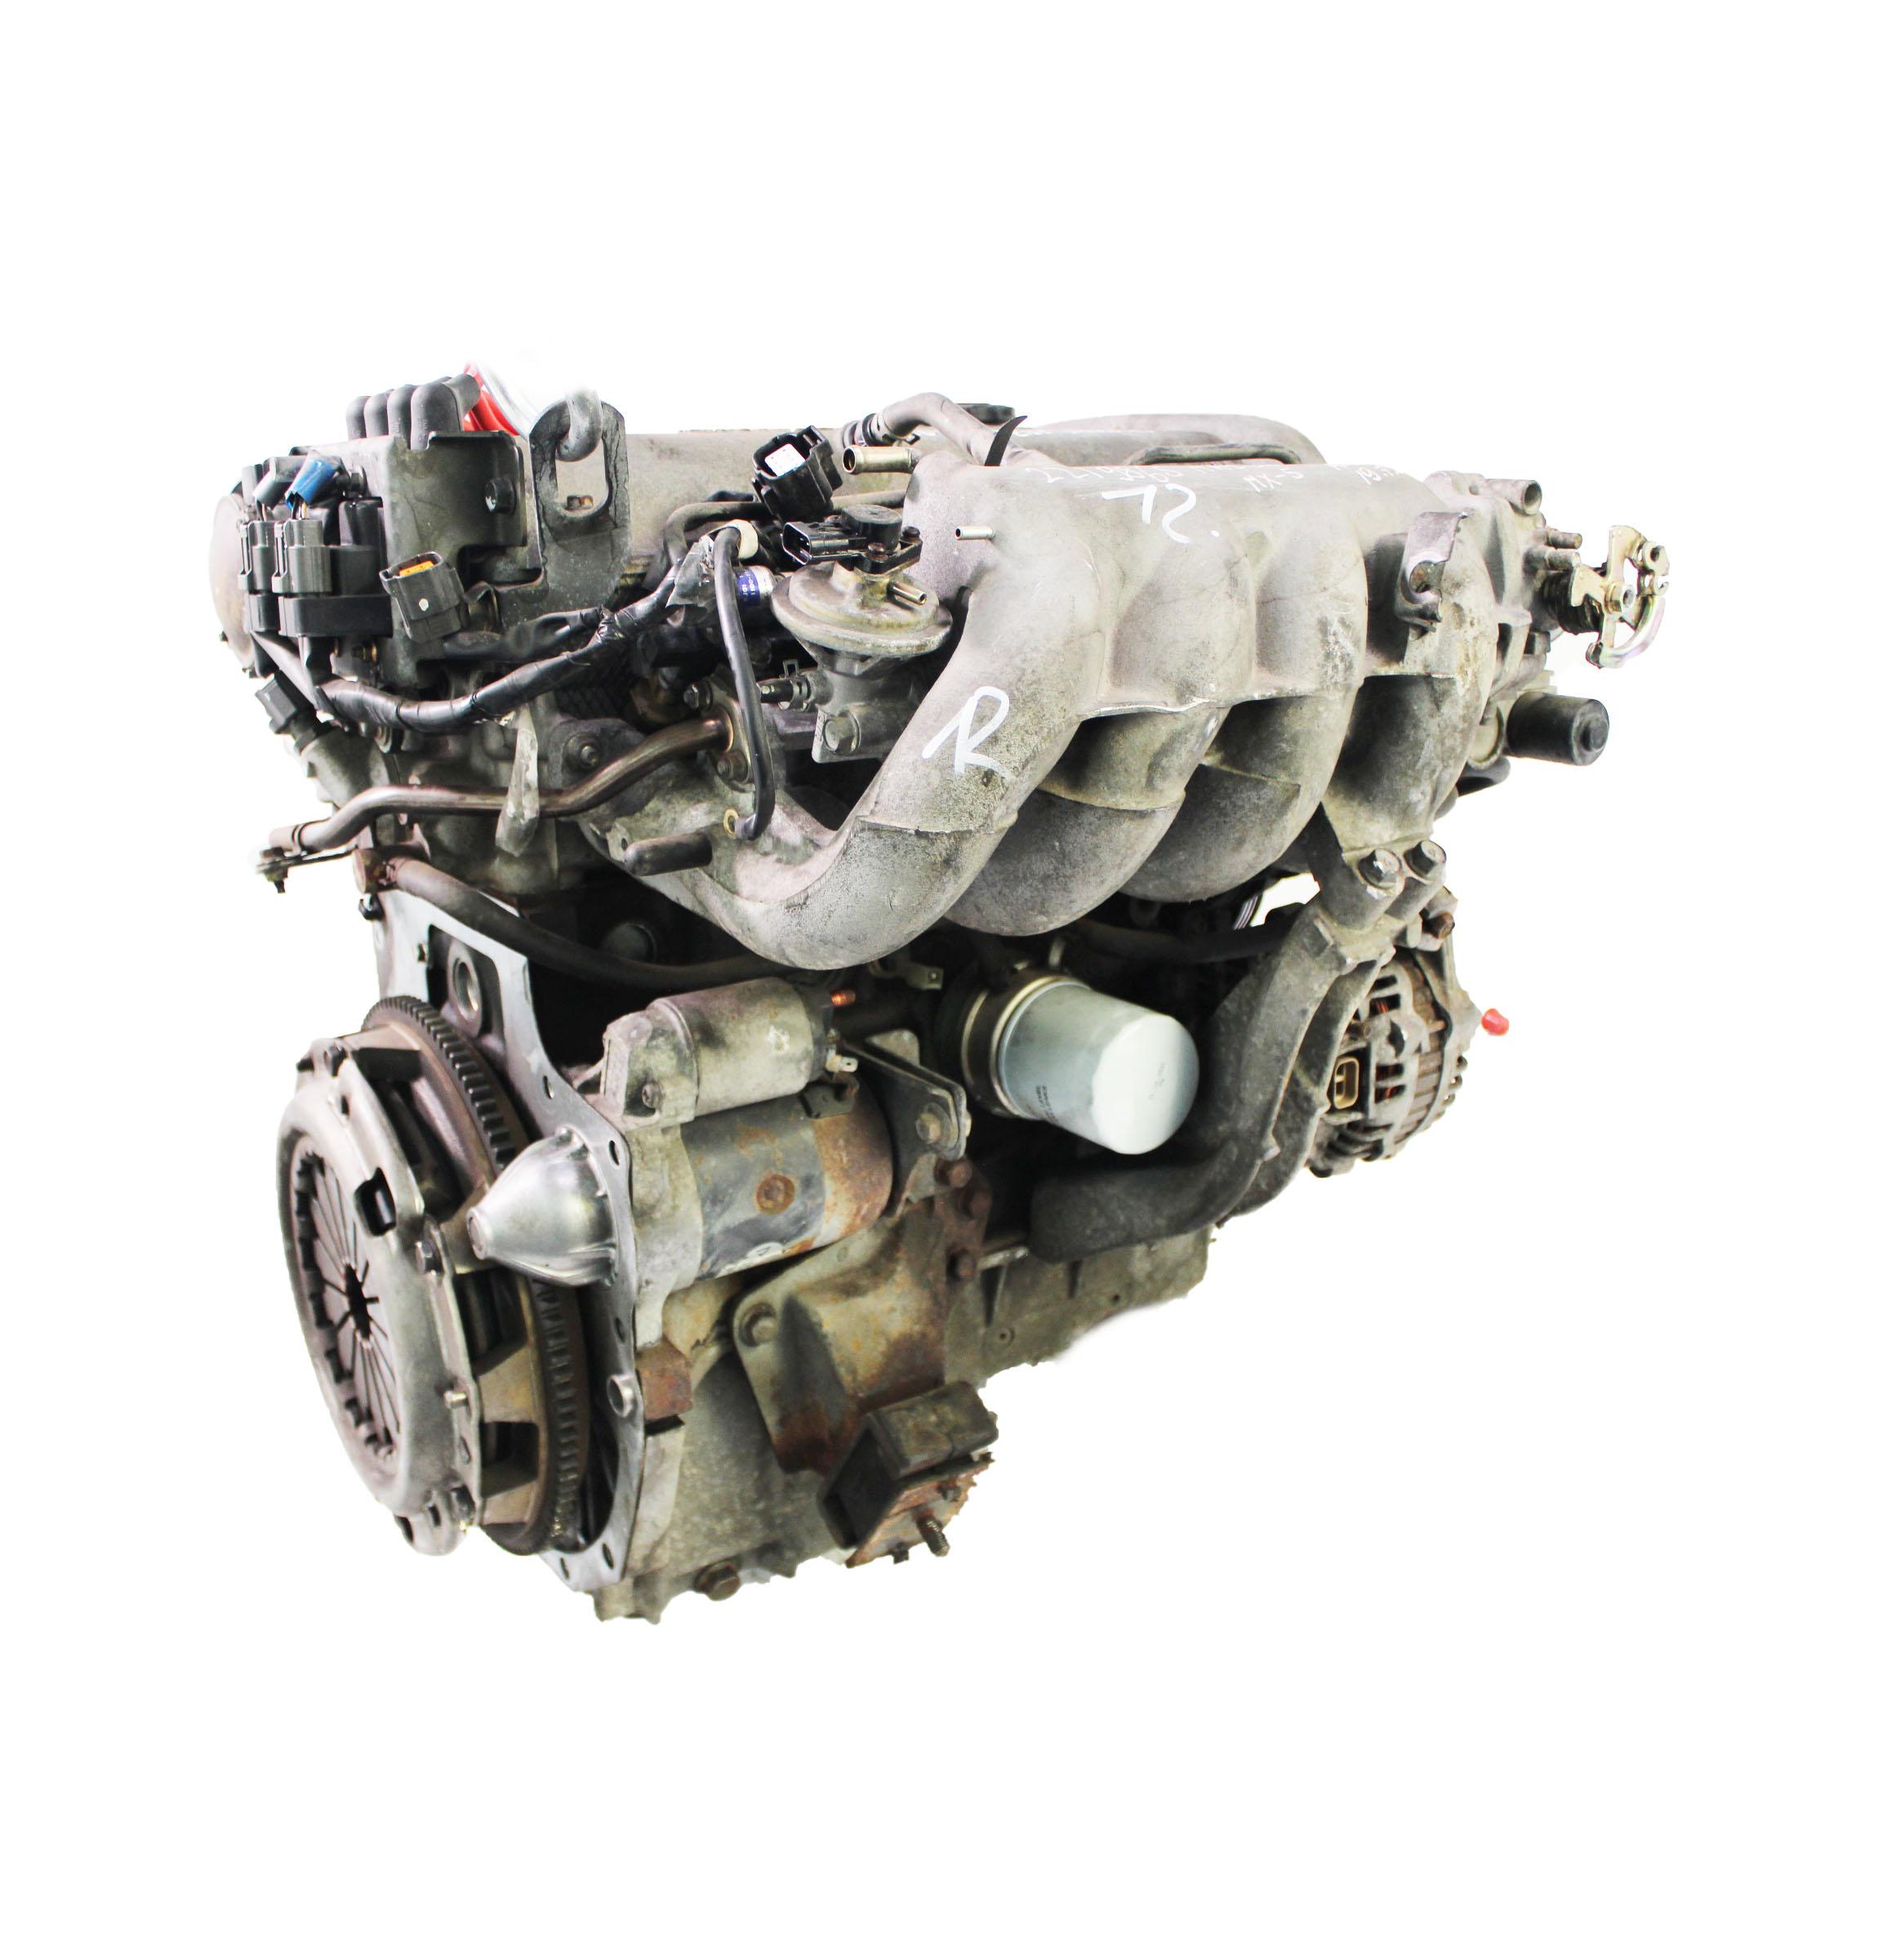 Motor für Mazda MX5 MX-5 MK1 I NA 1,8 BP BPF1 130 PS